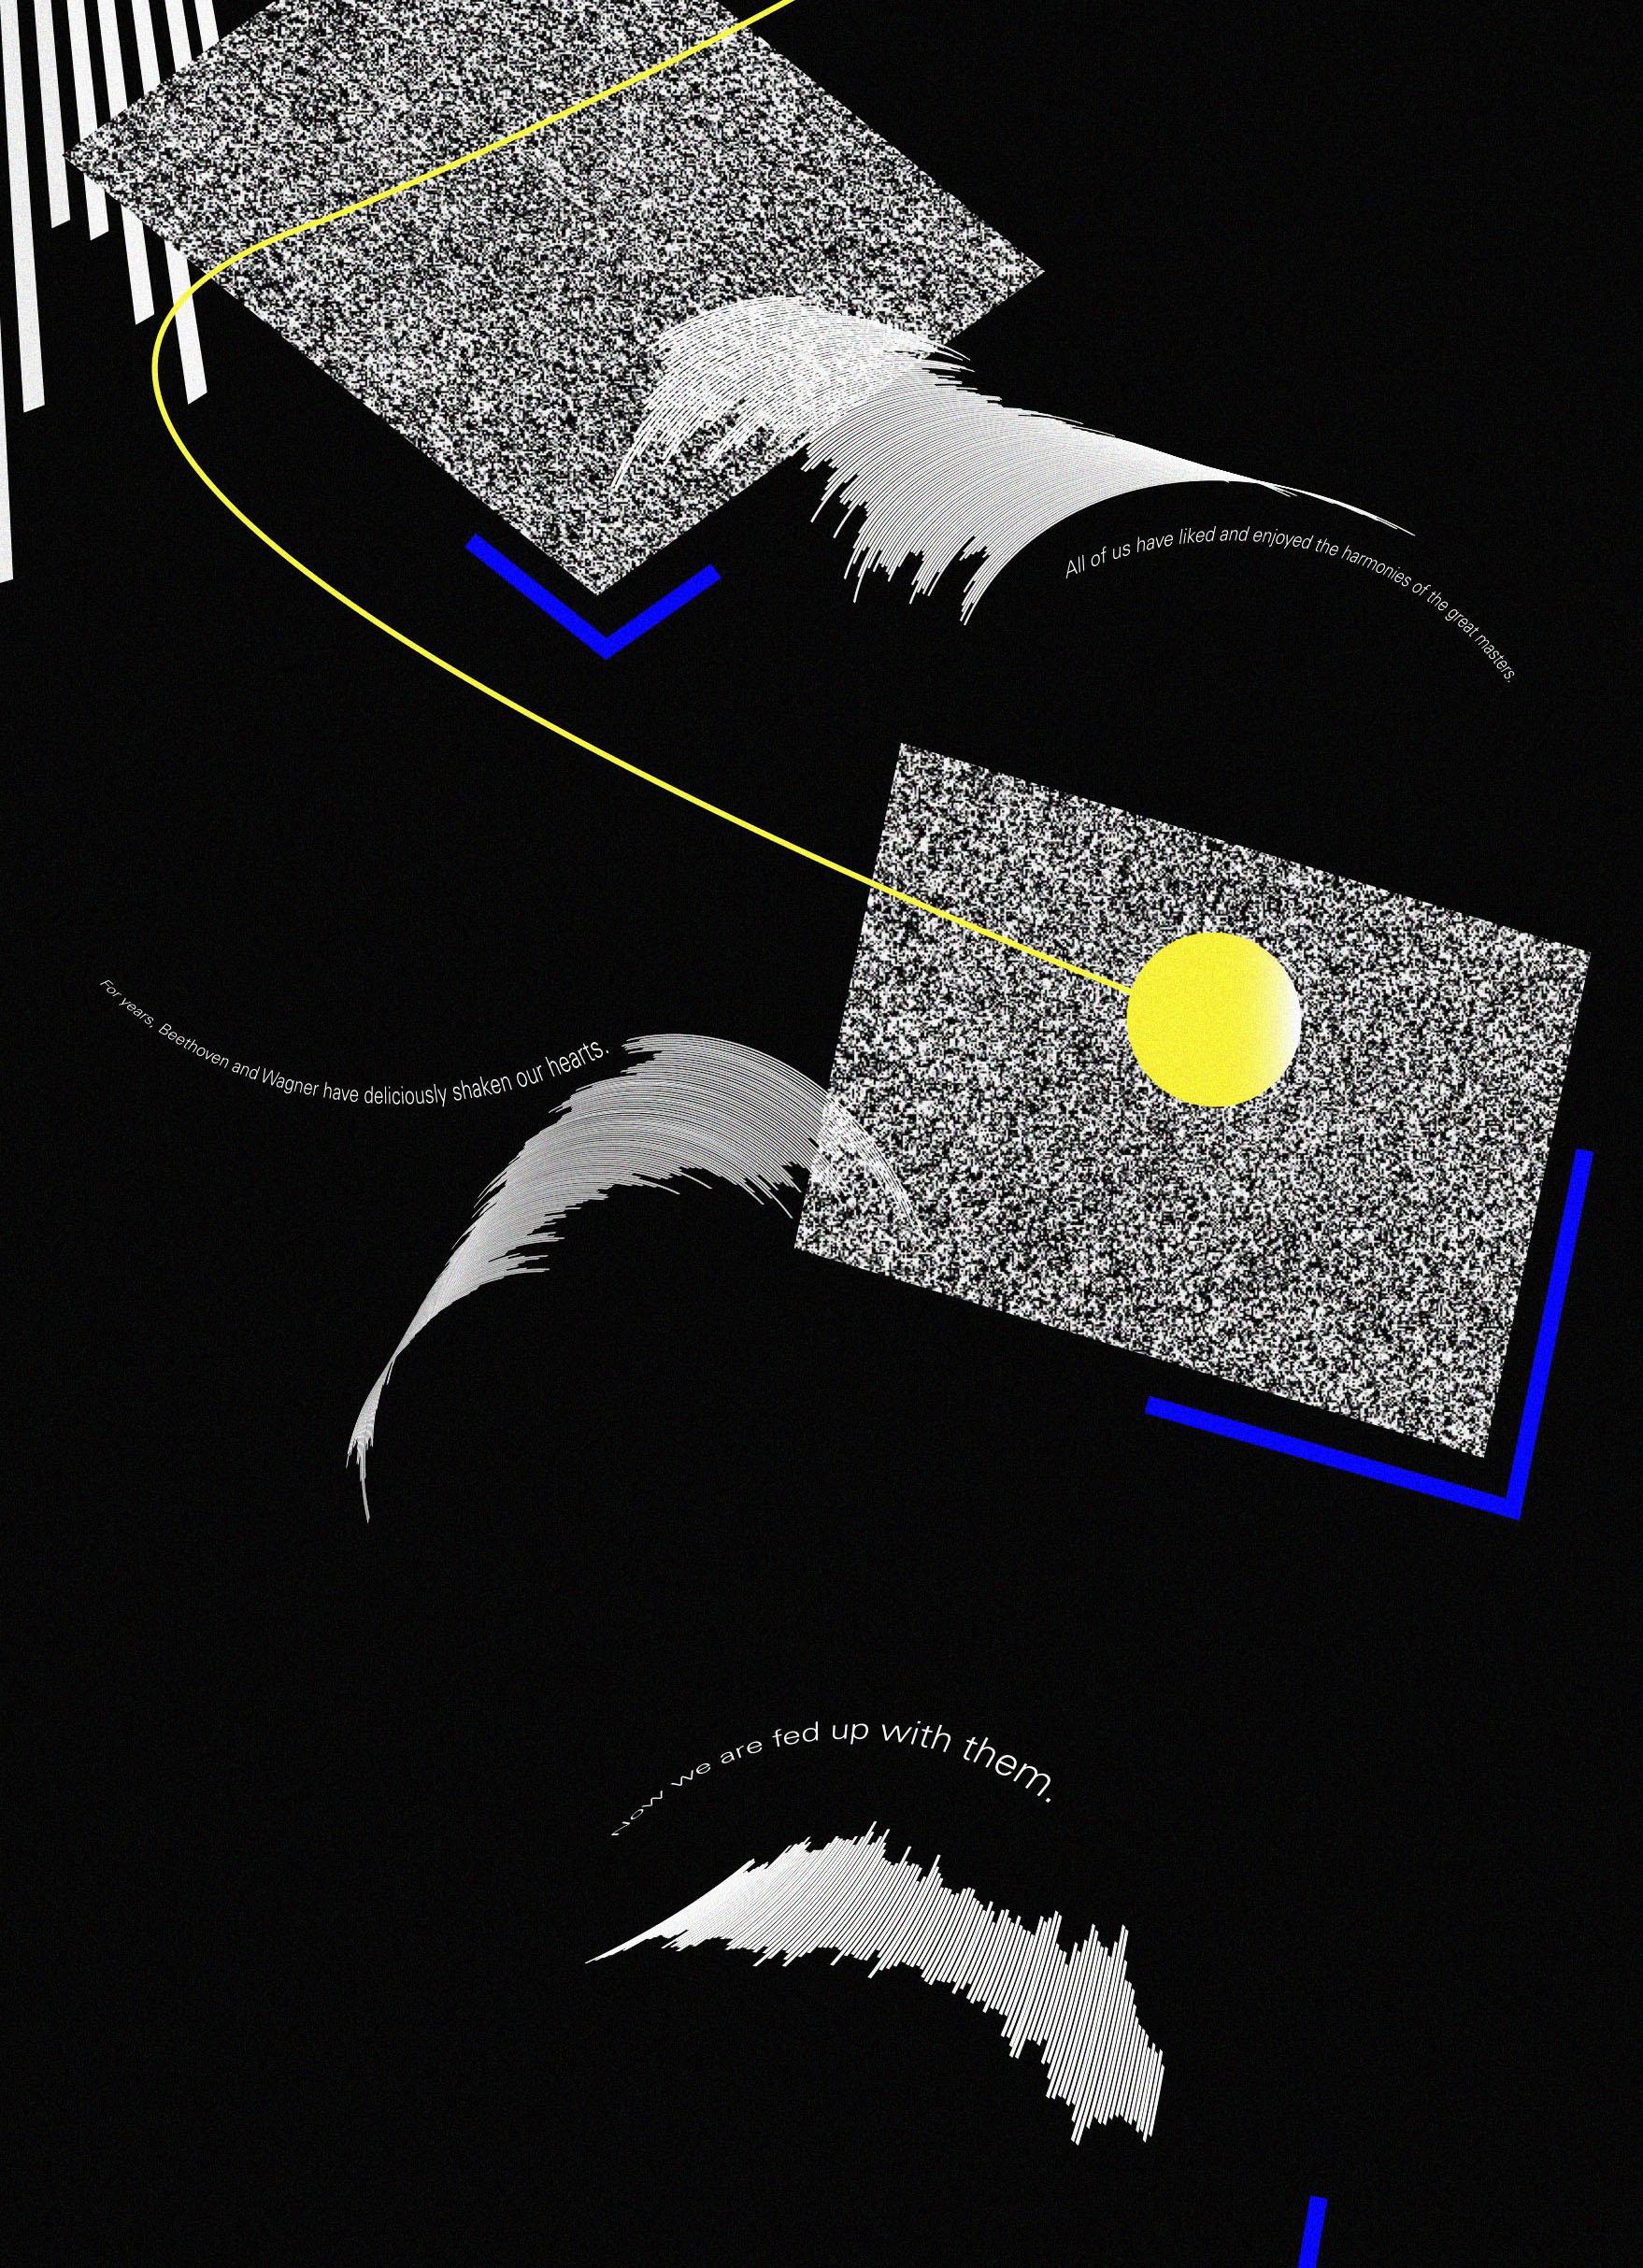 MasayaKochi_PosterDesign_TheArtofNoise copie 3.jpg